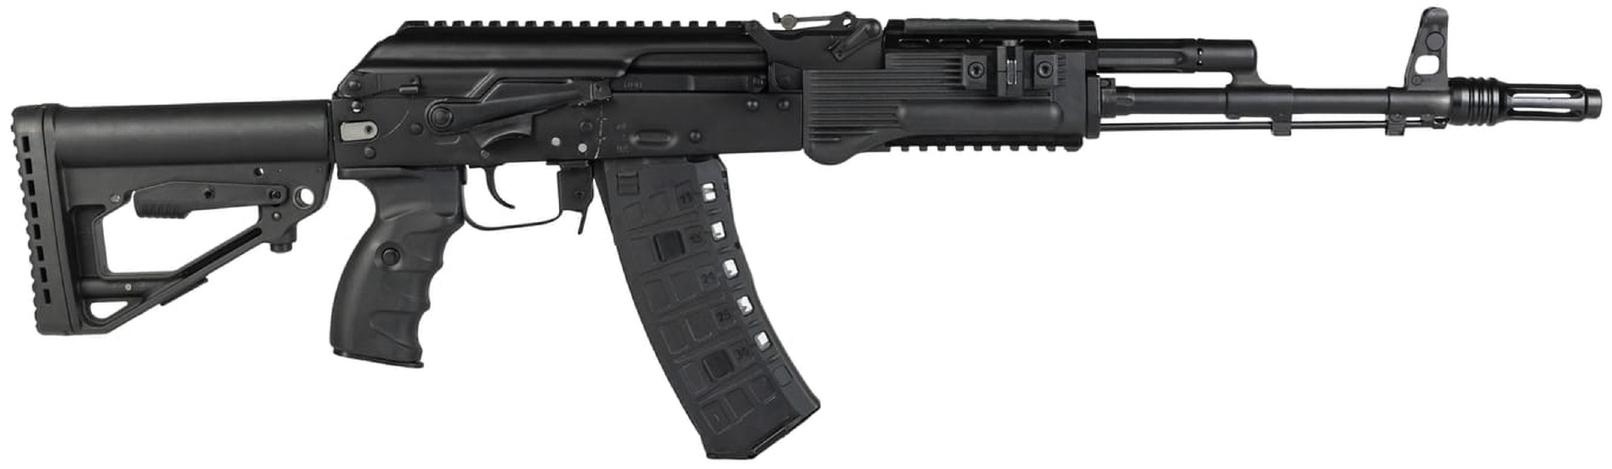 AK-200